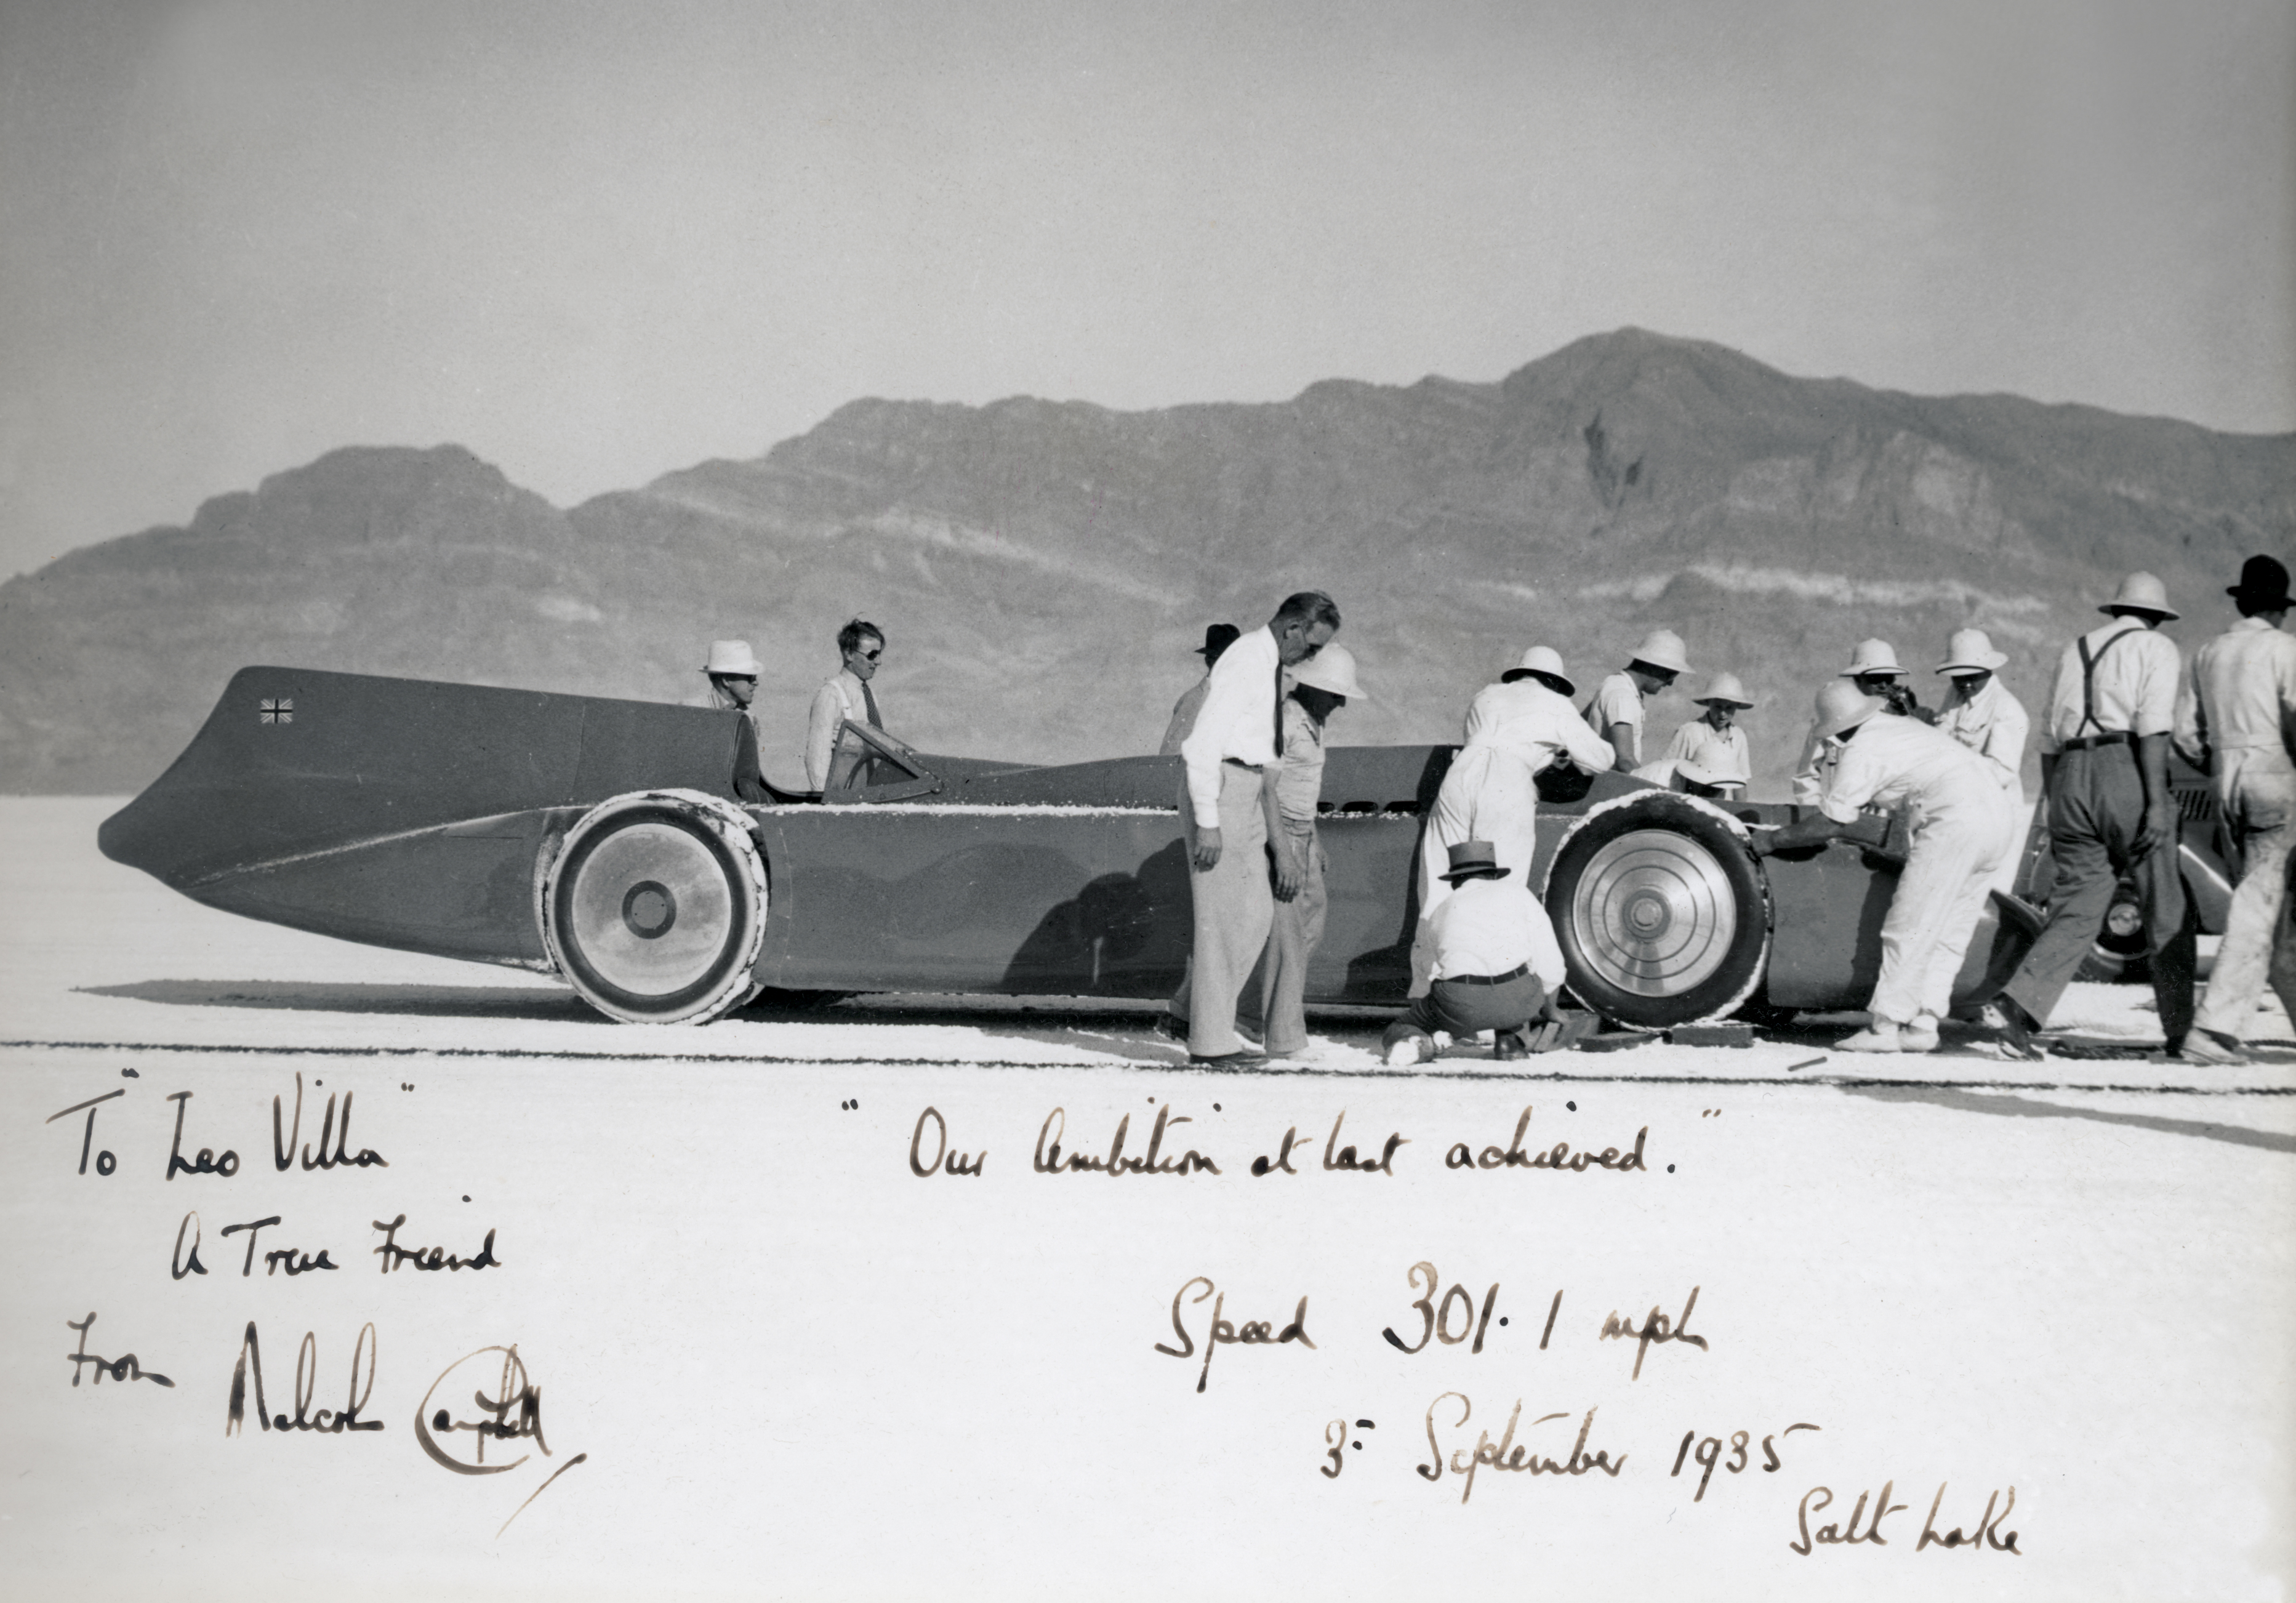 Photo courtesy: Rolls-Royce